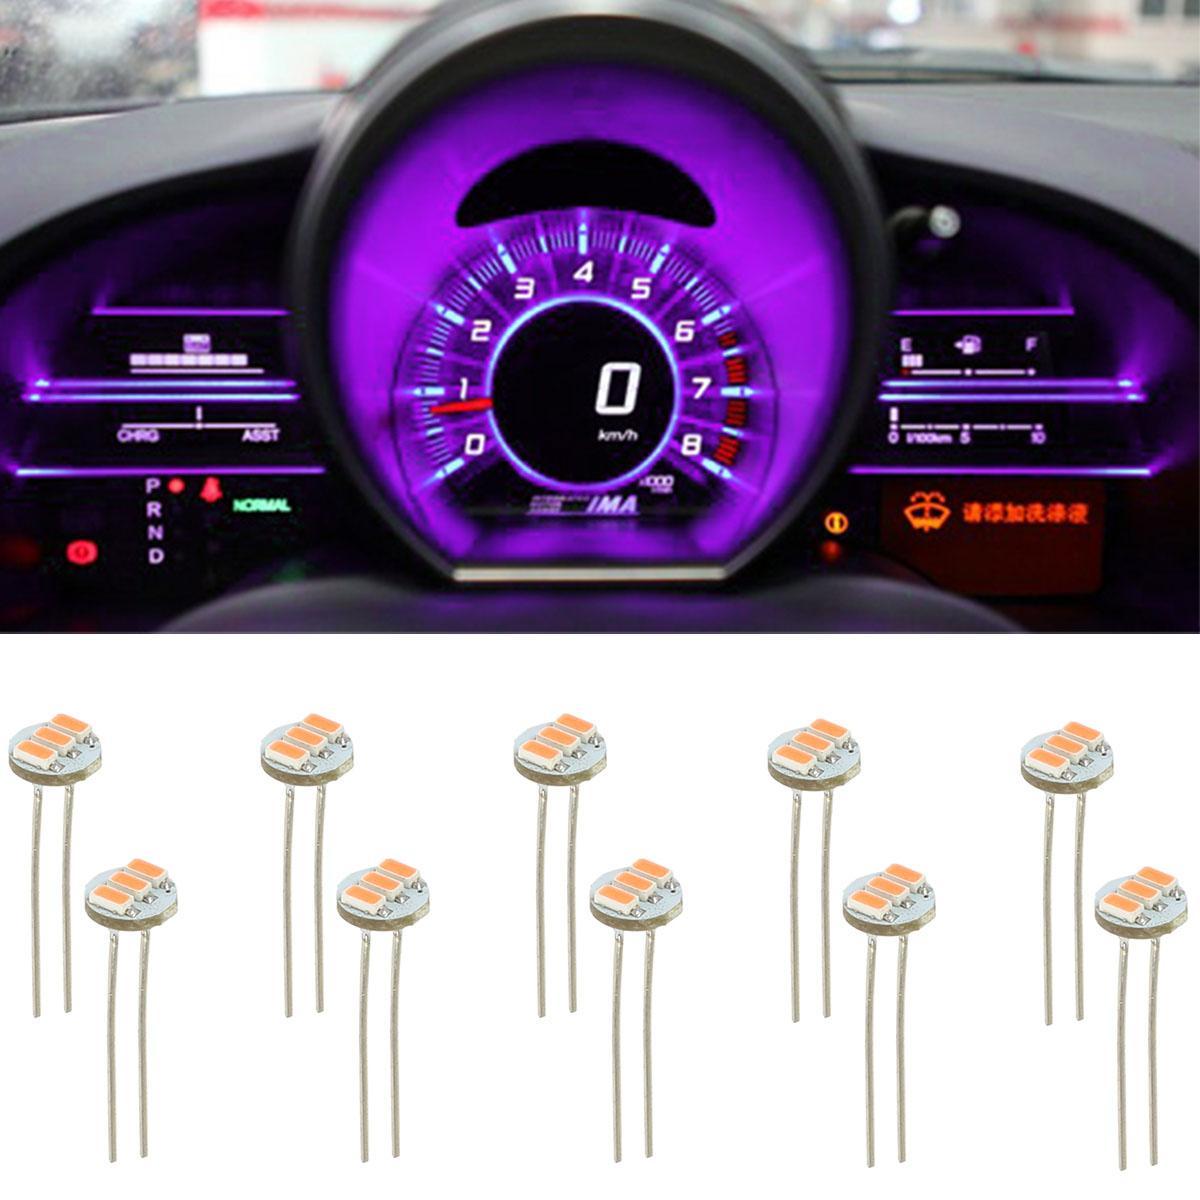 10x T5 Pink Purple Soldering LED Bulb Dash Instrument